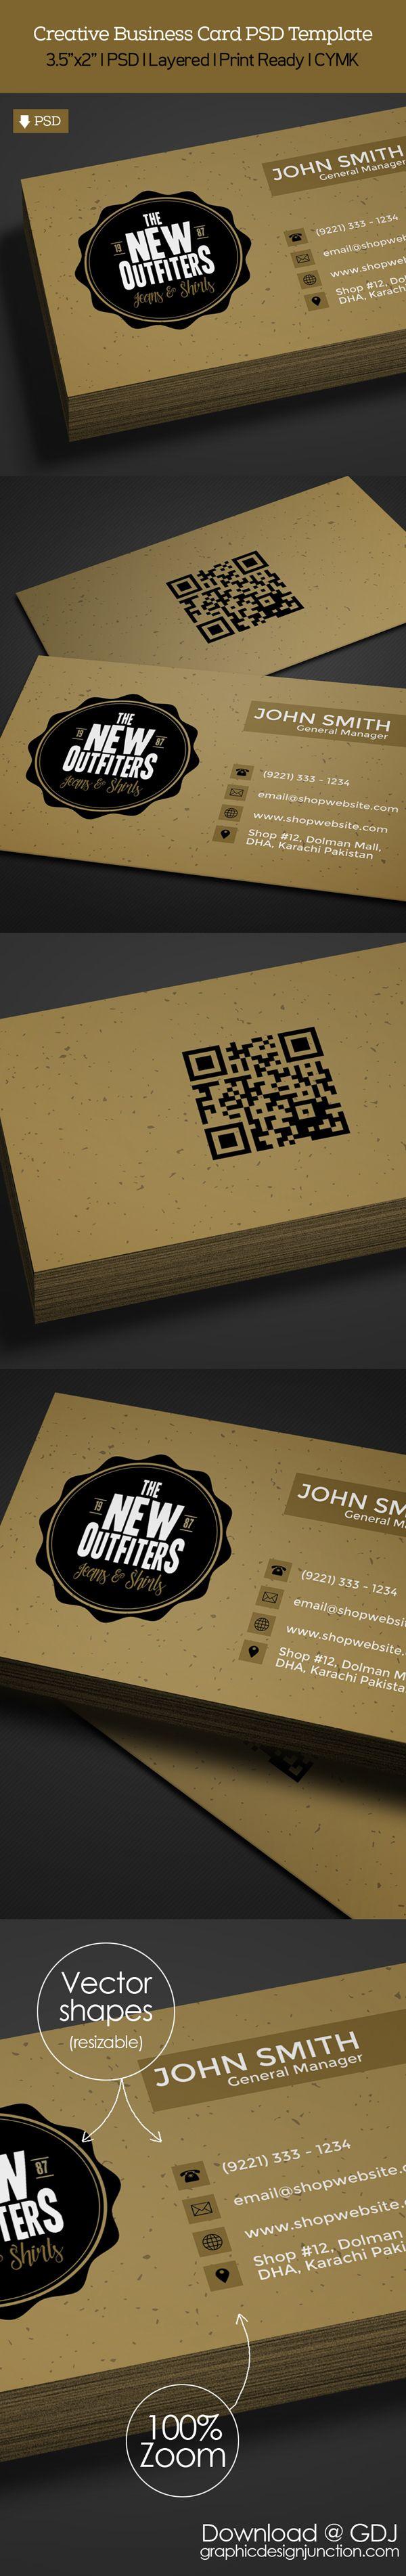 freebie vintage business card psd template